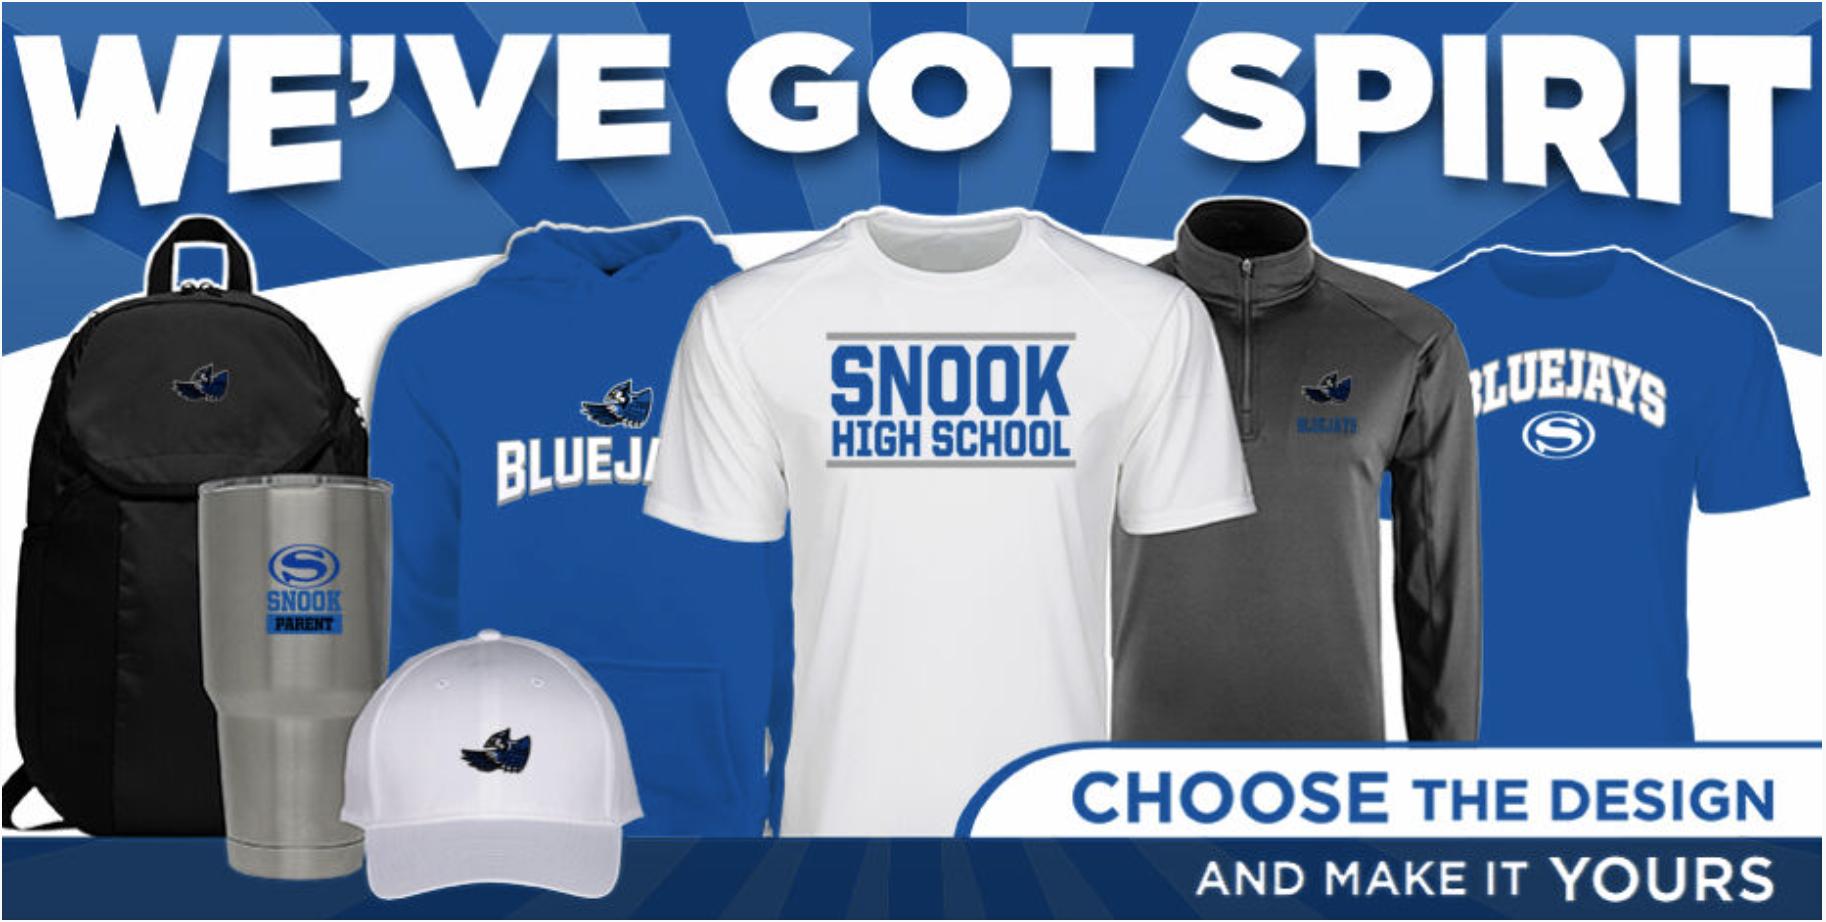 Snook Team Store